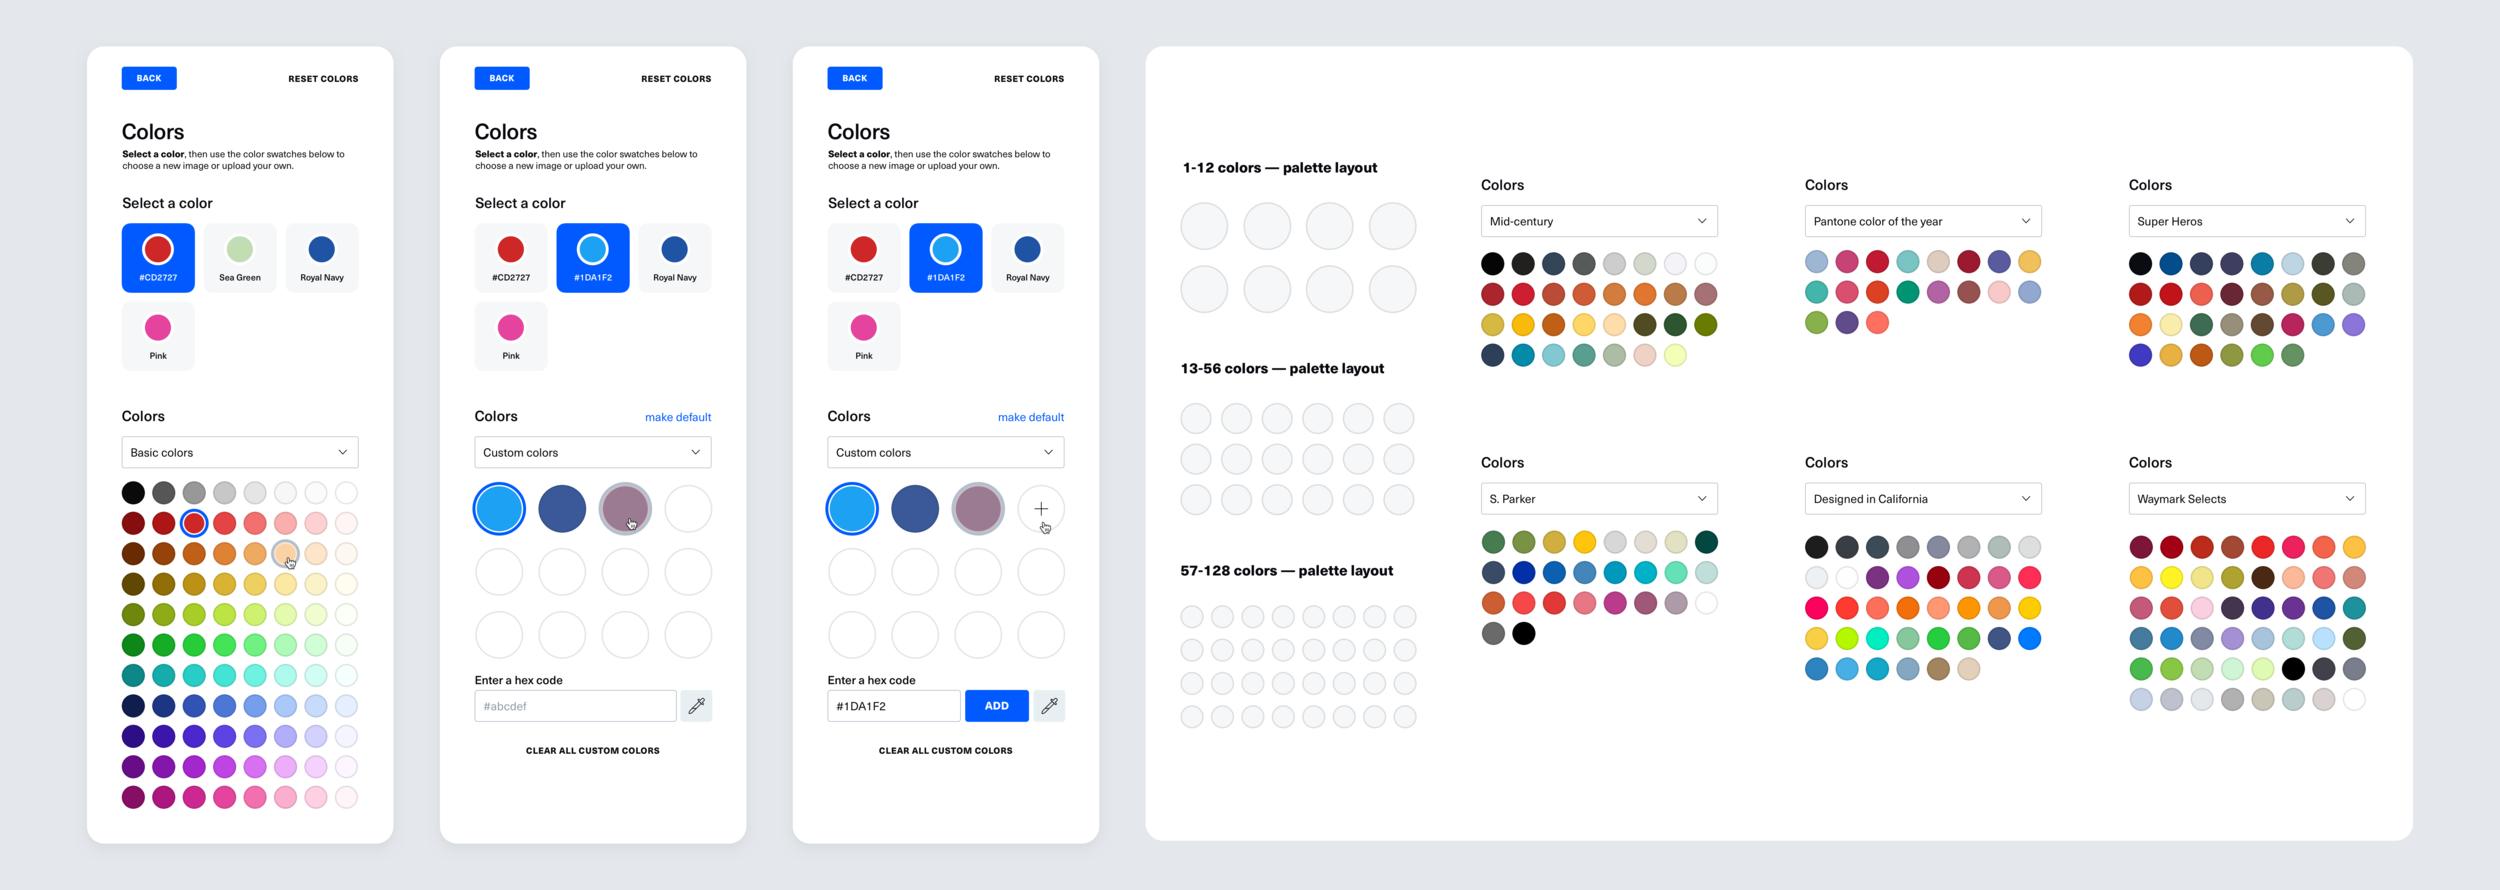 Editor Color Management